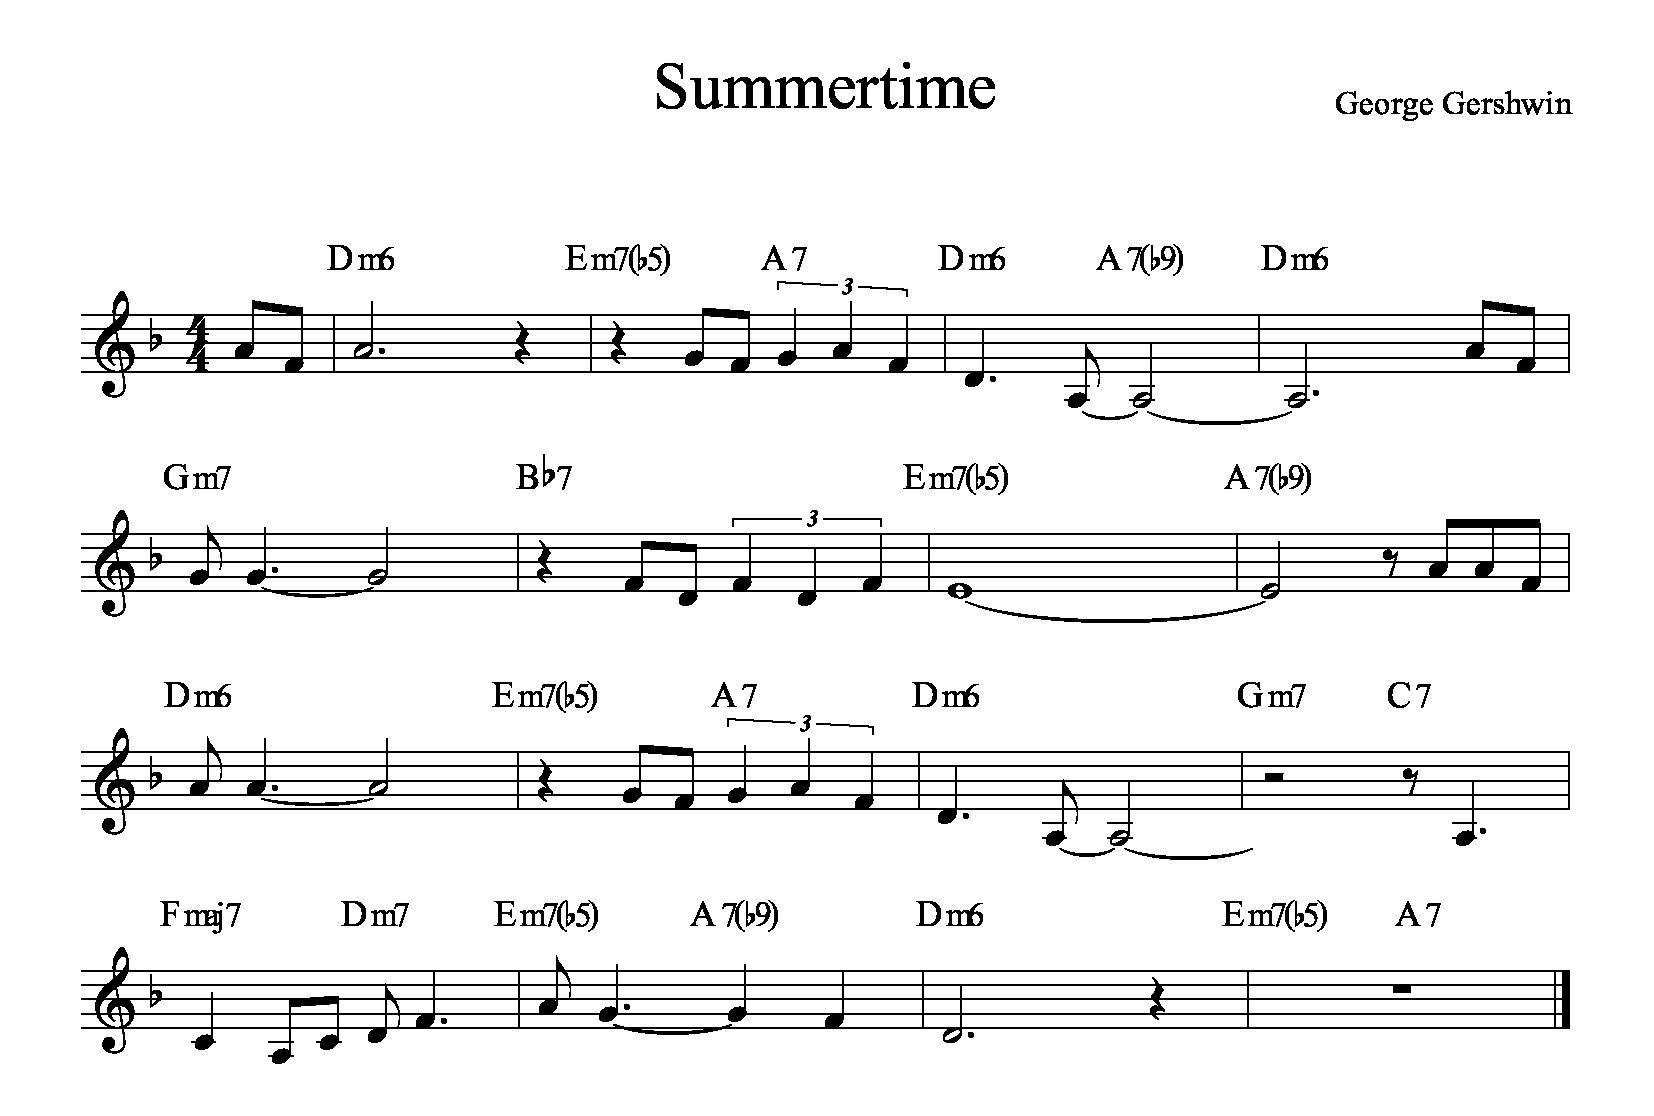 Summertime-George-Gershwin-AABA-16-misure